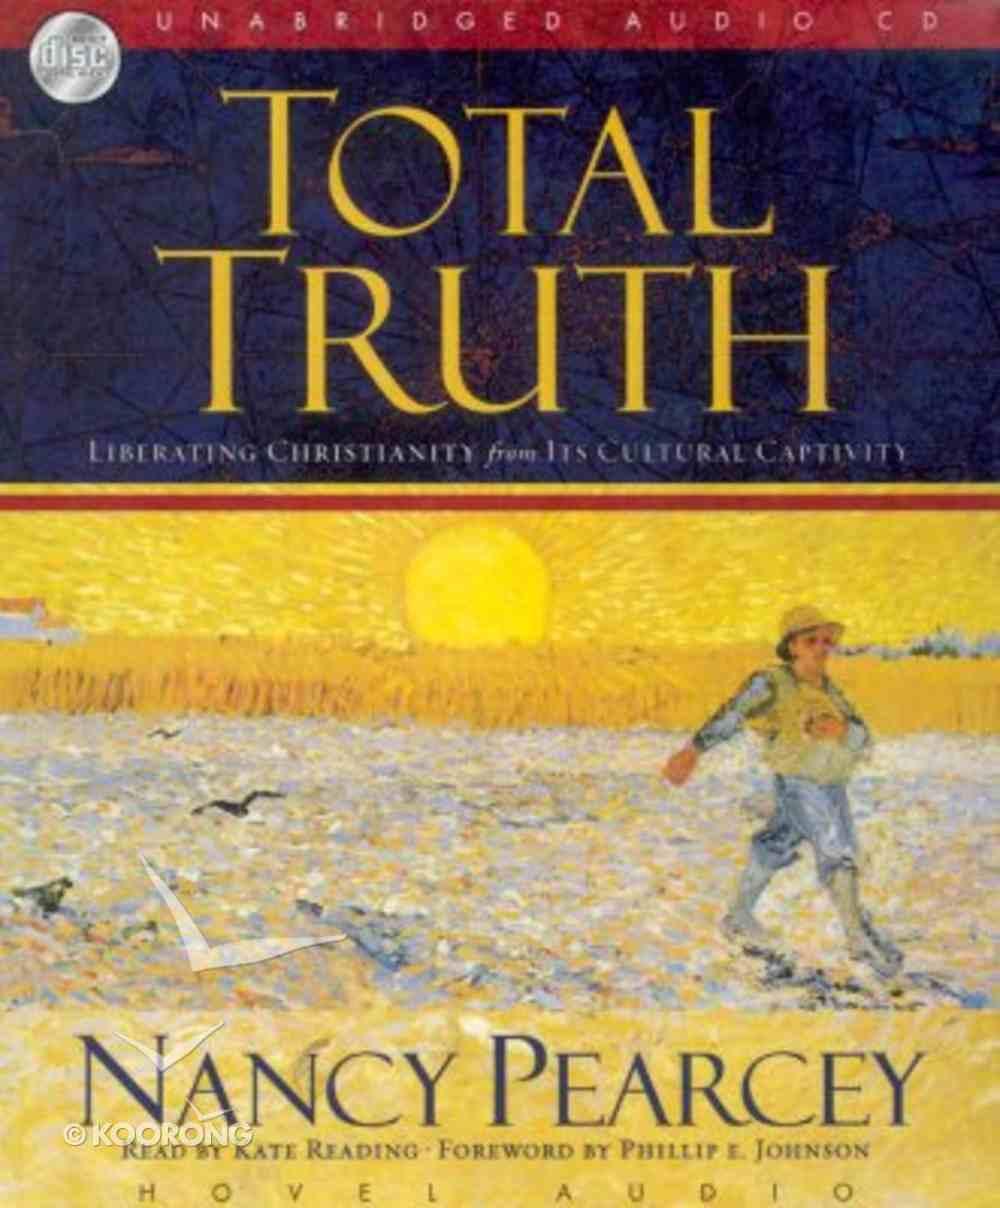 Total Truth (Unabridged) (14cds) CD